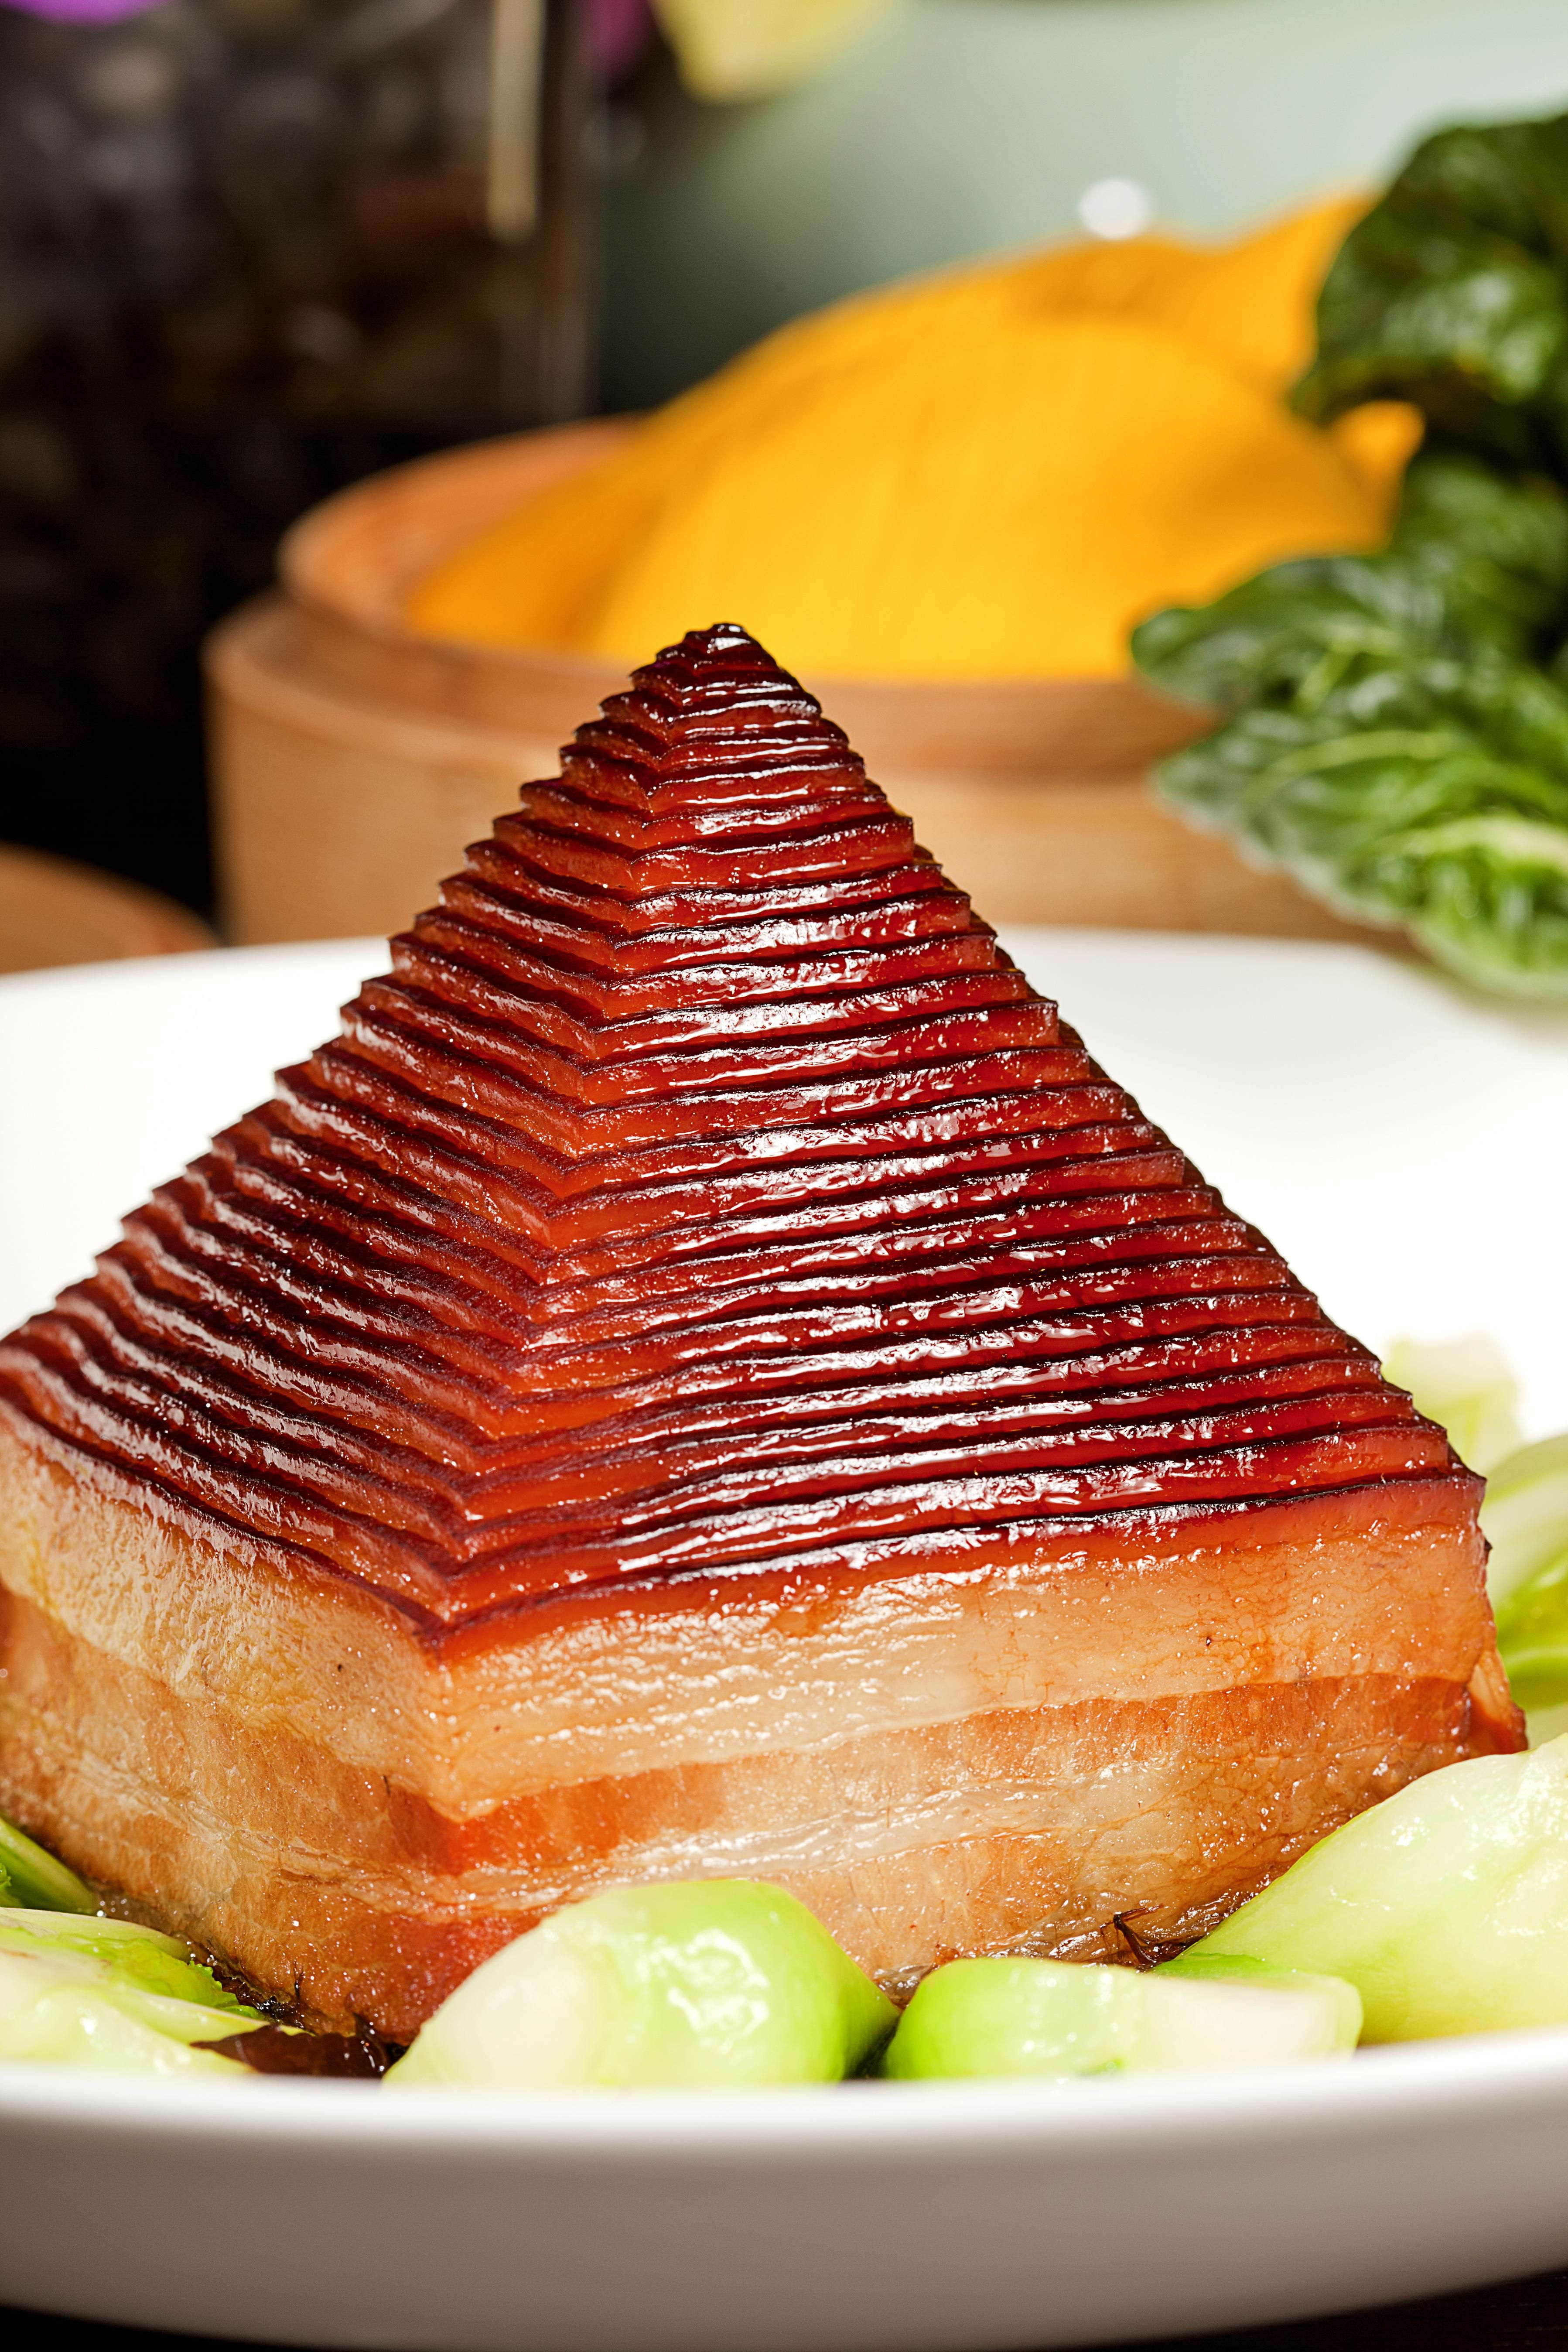 Hangzhou Signature Dish Pyramid Braised Soy Prok And Bamboo Shoot Serviced With Pumpkin Bun Food China Food Gourmet Tea